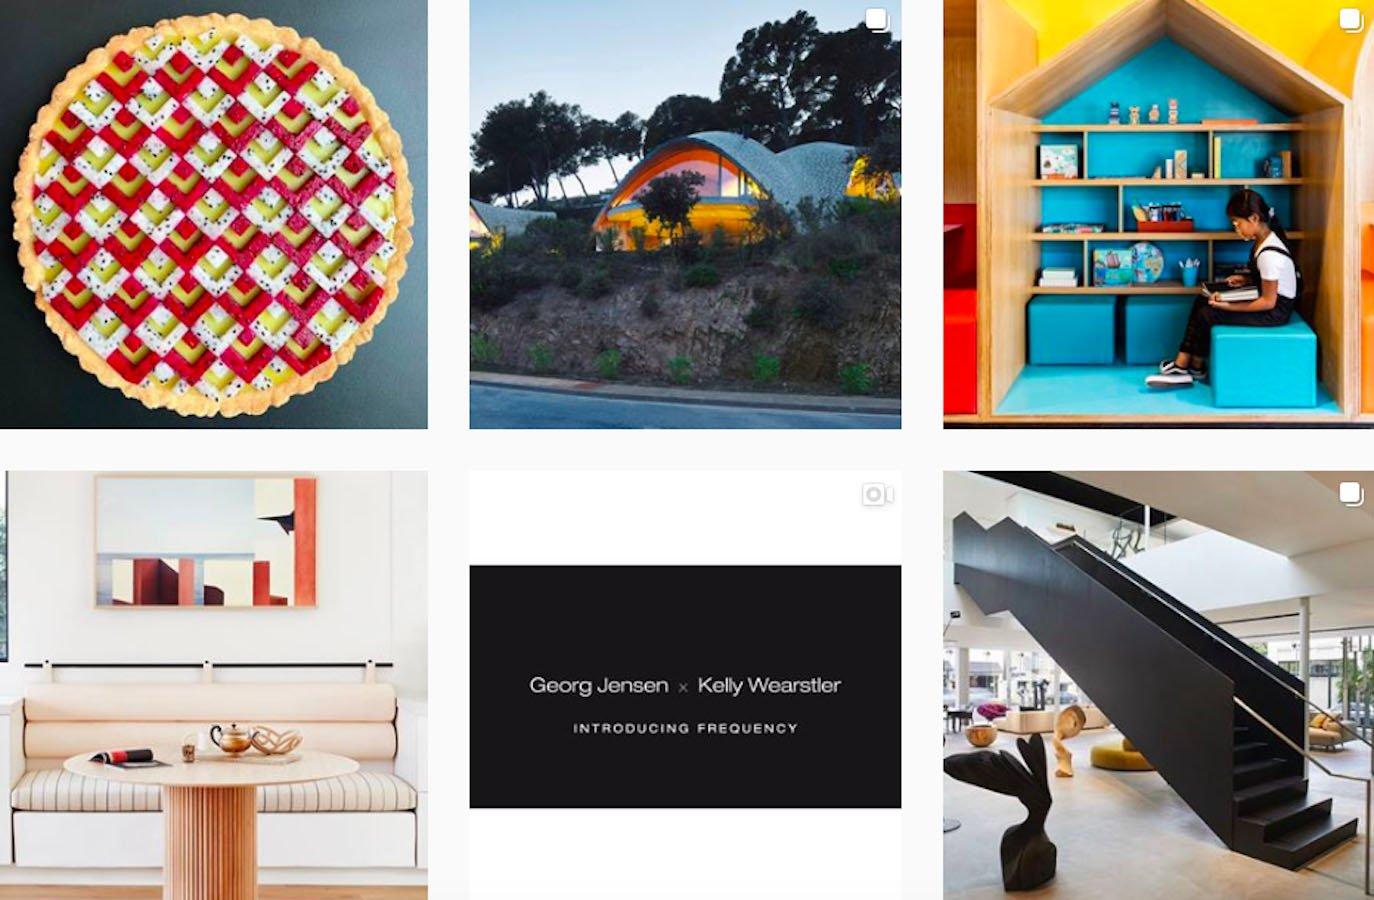 Web Design Inspiration: 110+ Accounts On Instagram and 10+ Best UX & Web Design Books in 2020 - designmilk